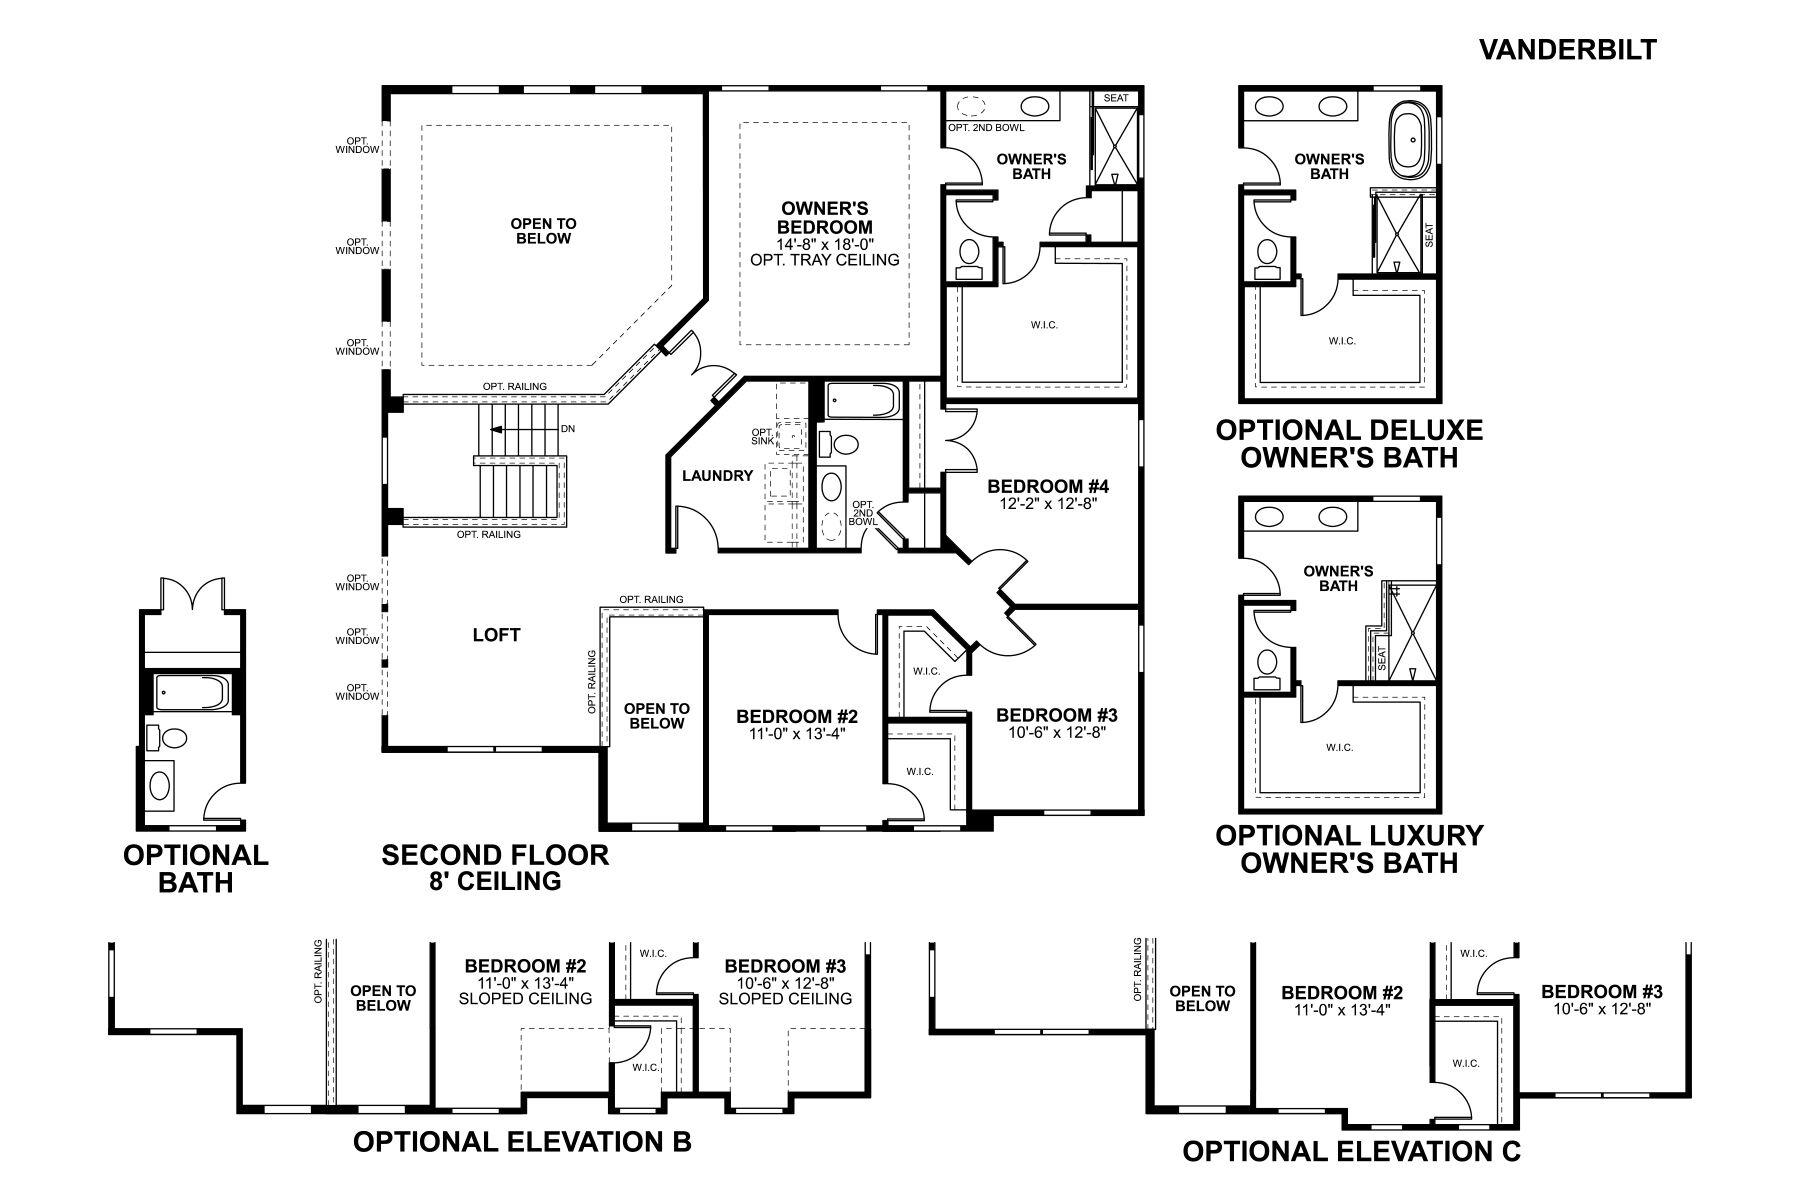 Vanderbilt Floorplan